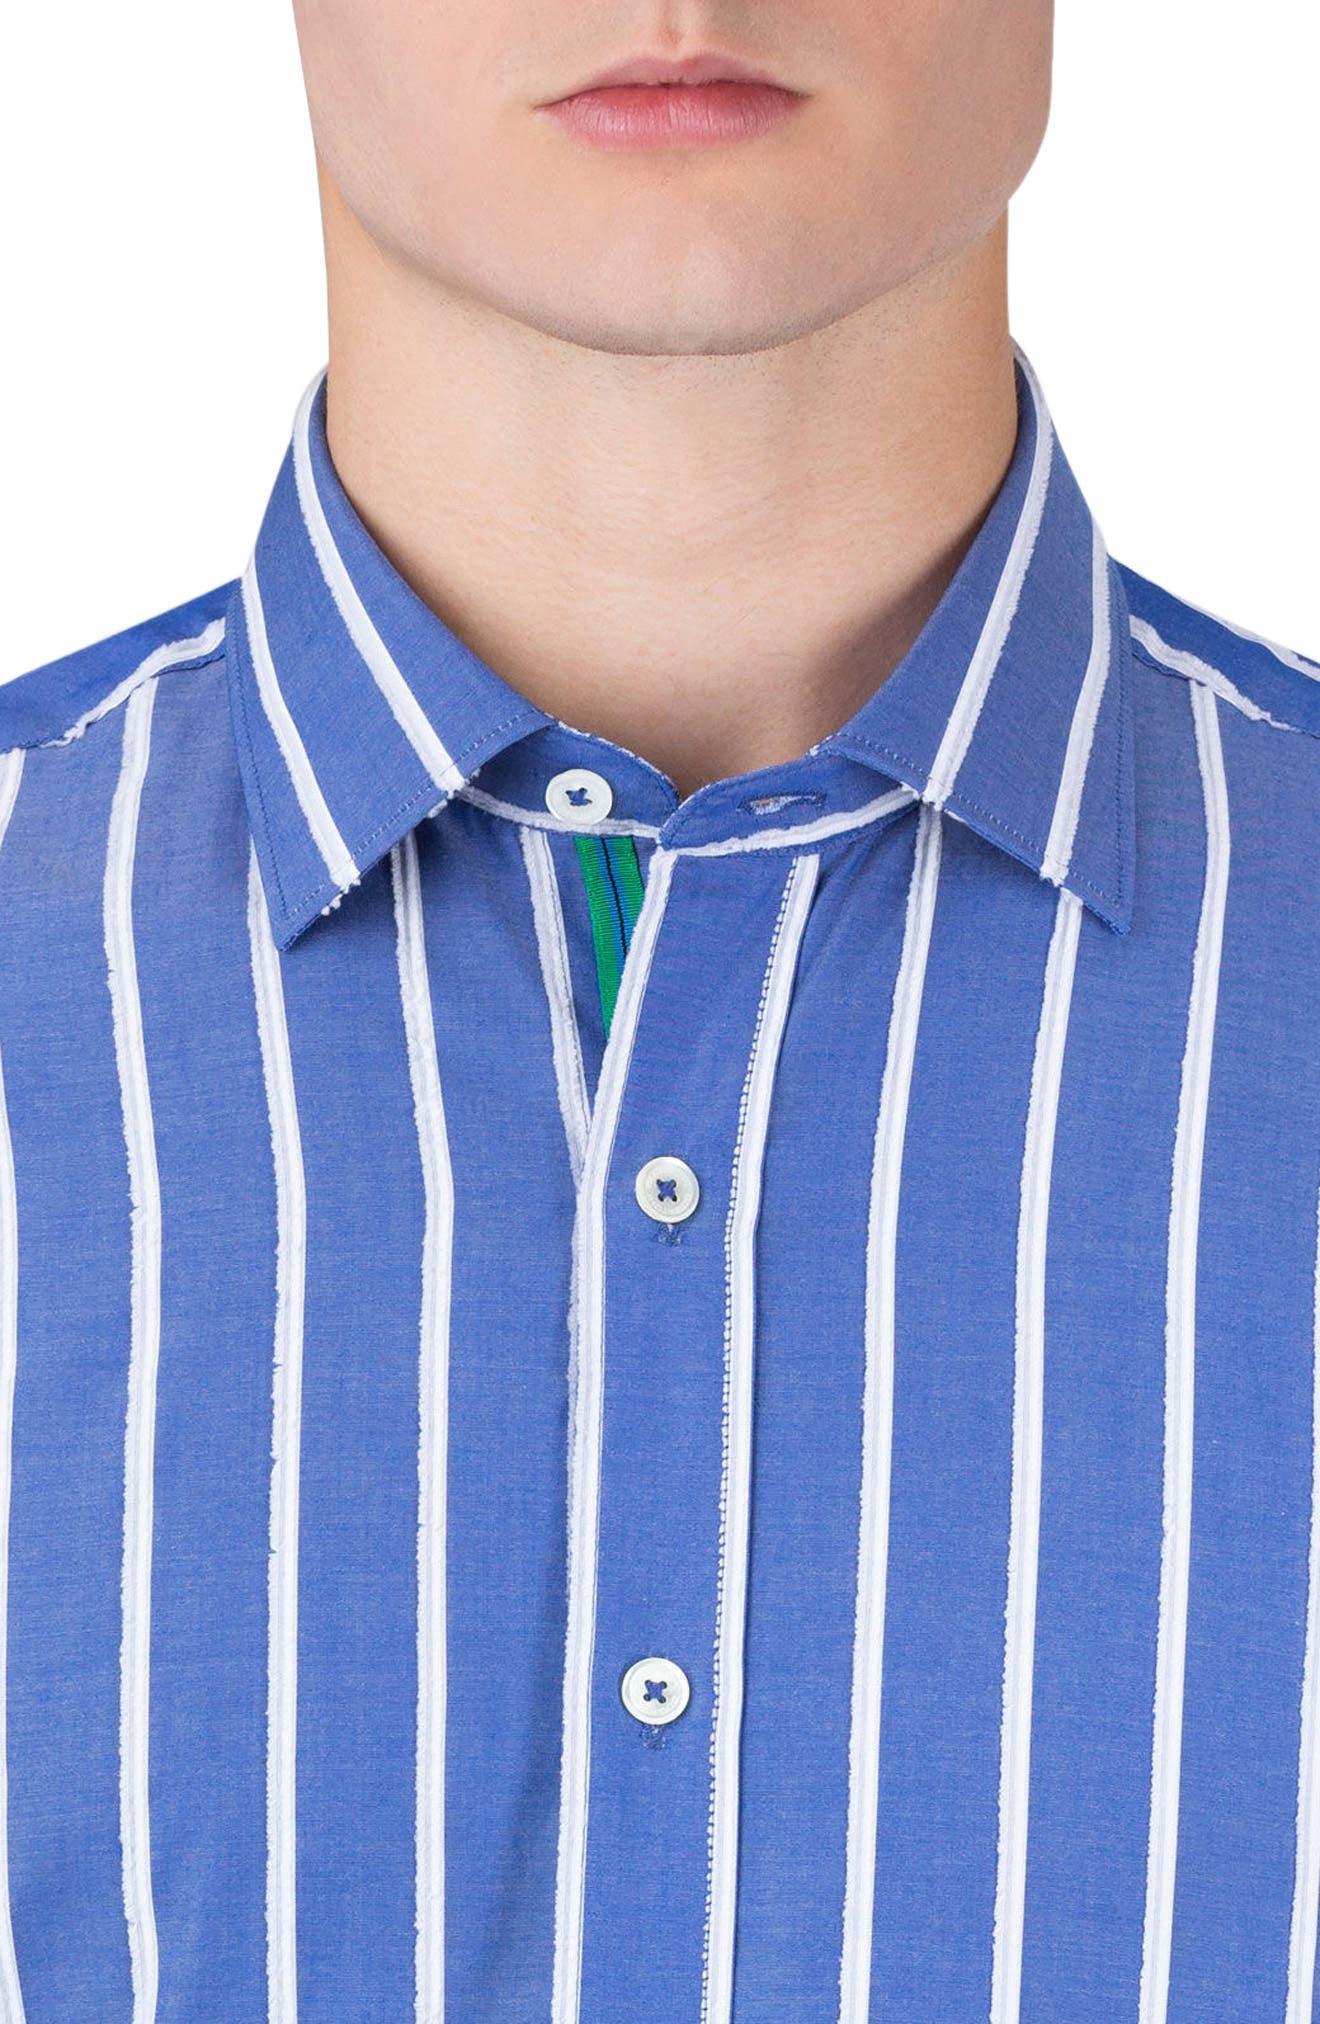 Classic Fit Vertical Stripe Sport Shirt,                             Alternate thumbnail 3, color,                             408